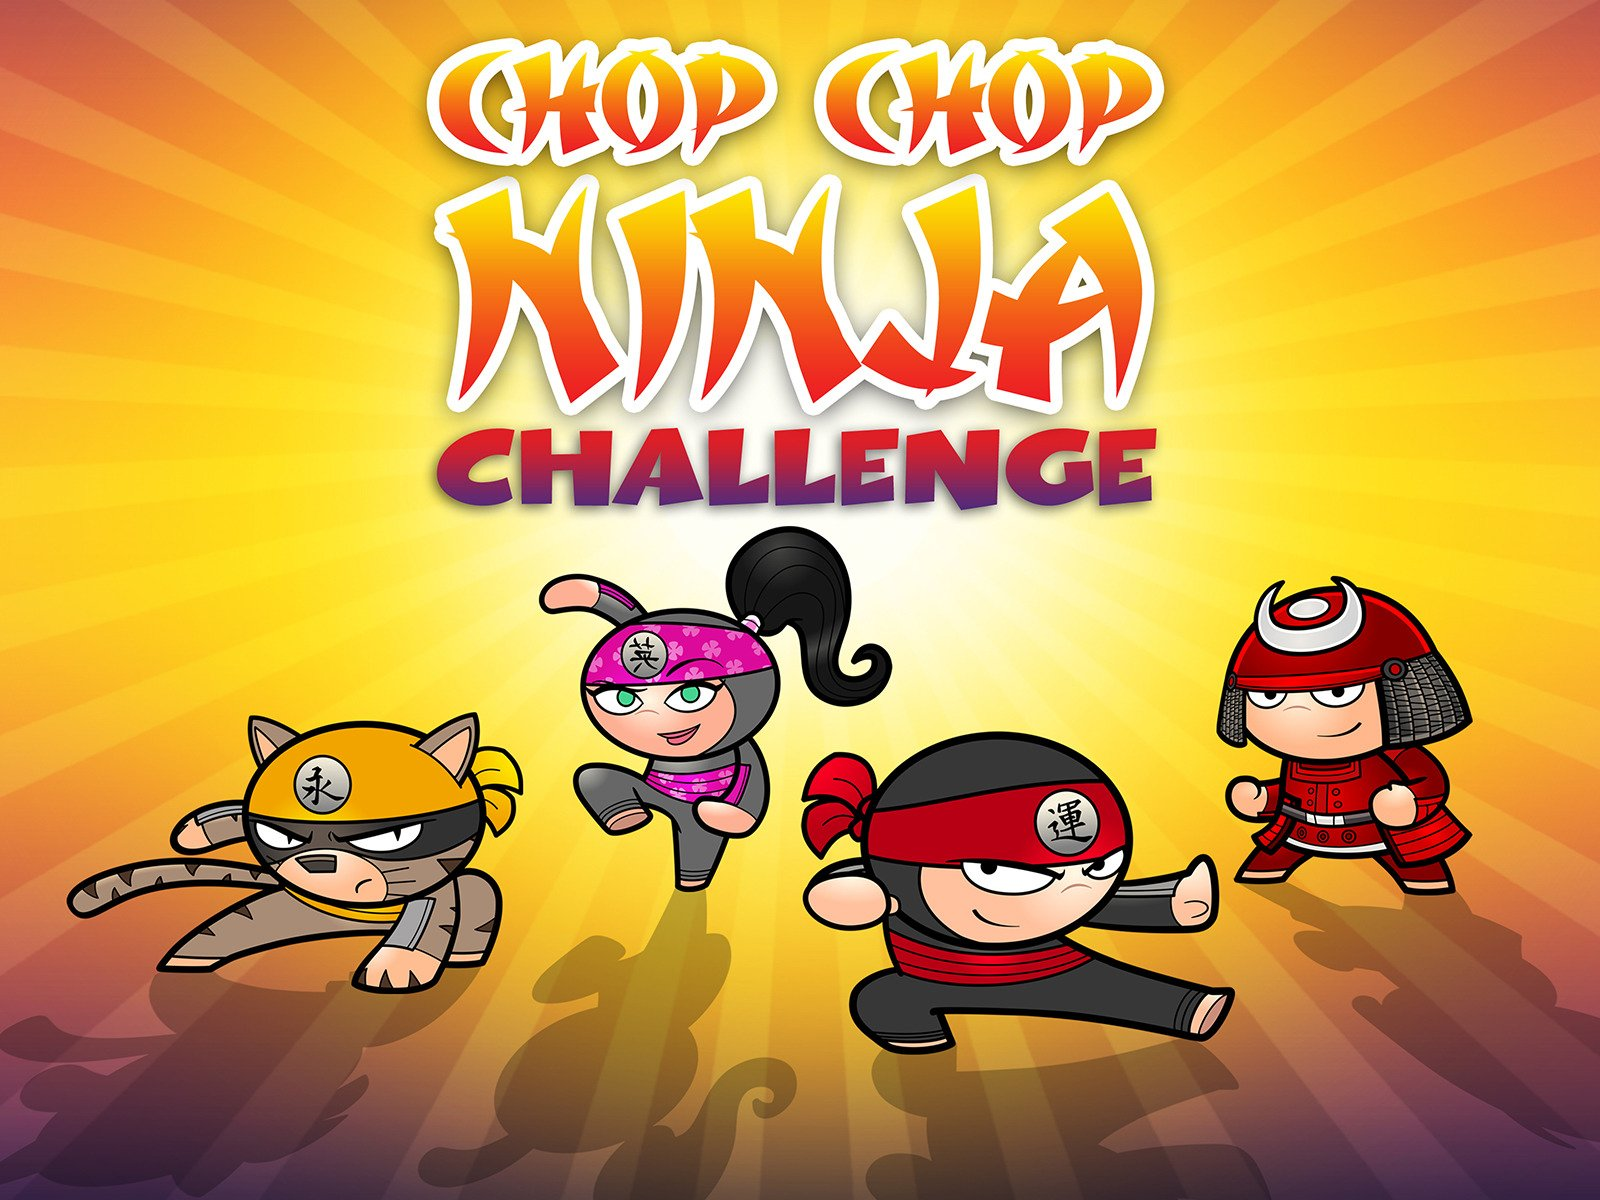 Chop Chop Ninja Challenge - Season 1